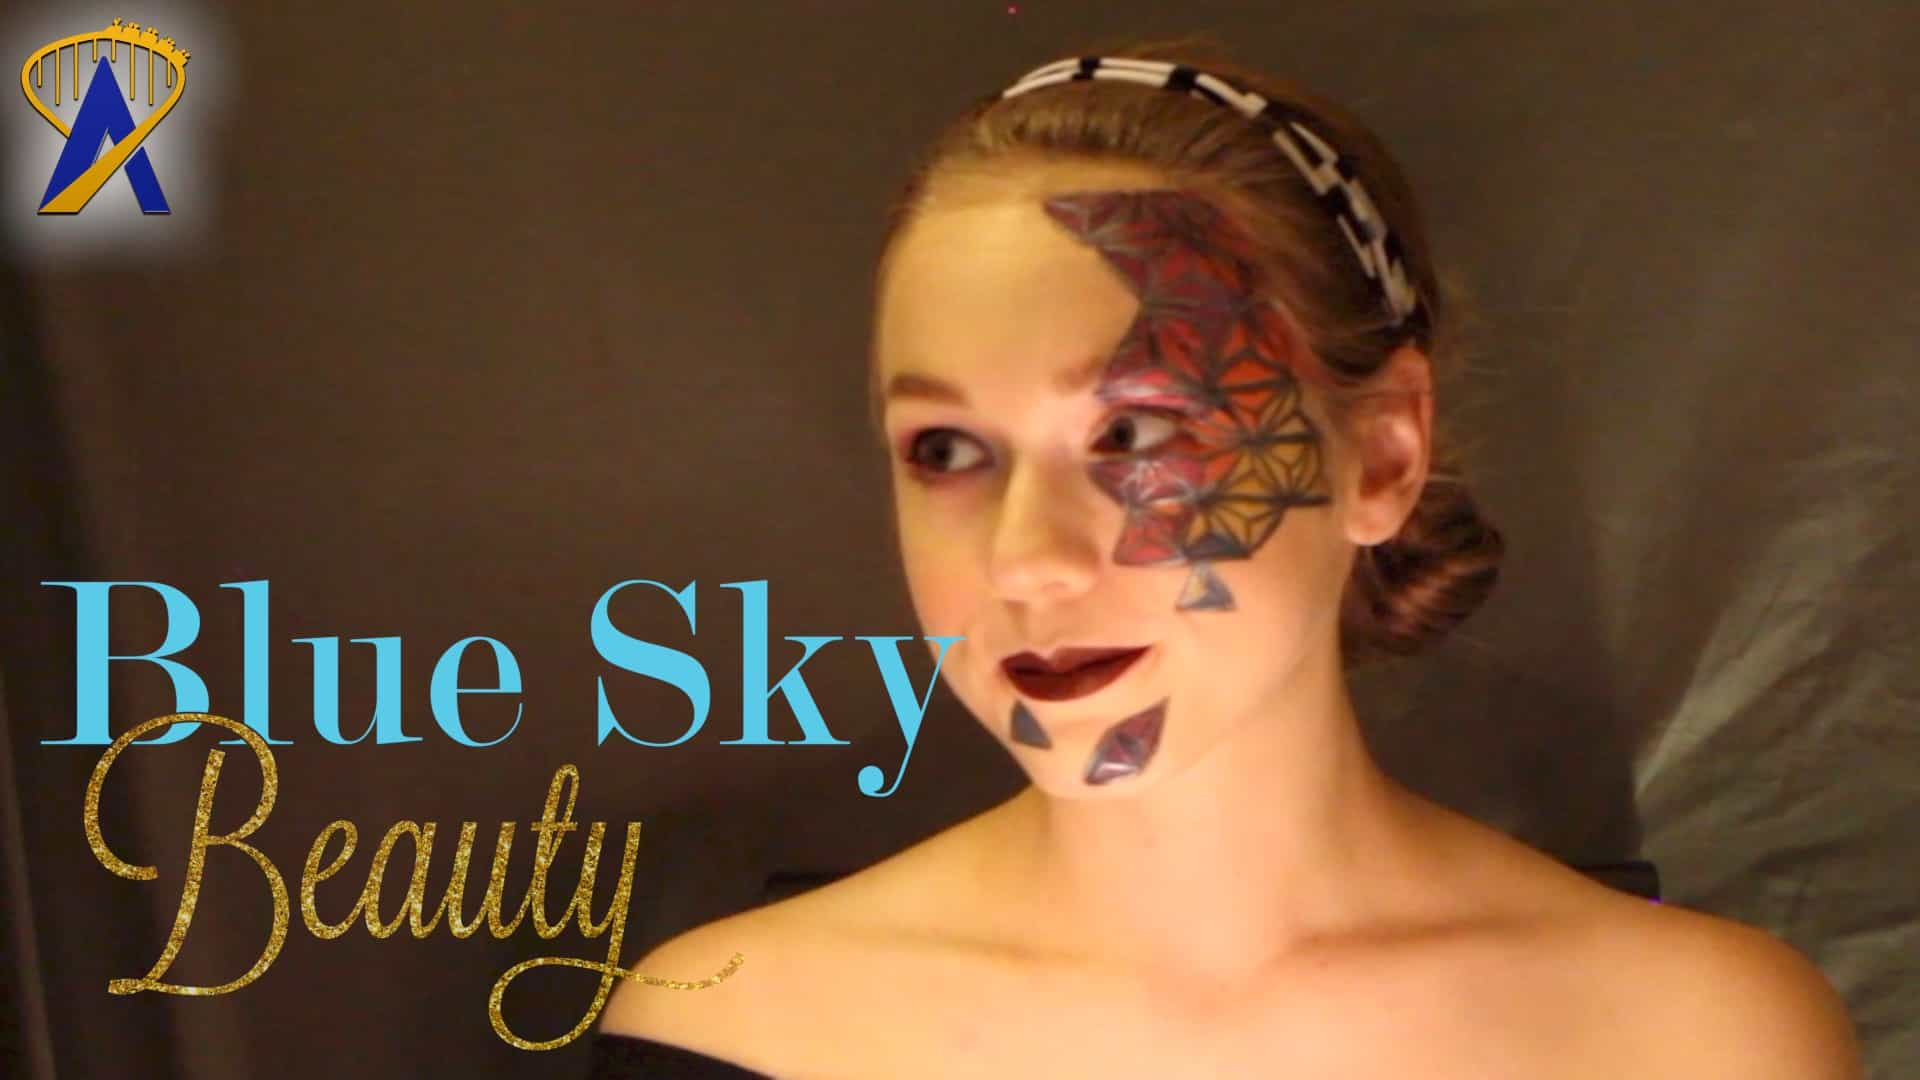 Skybeauty